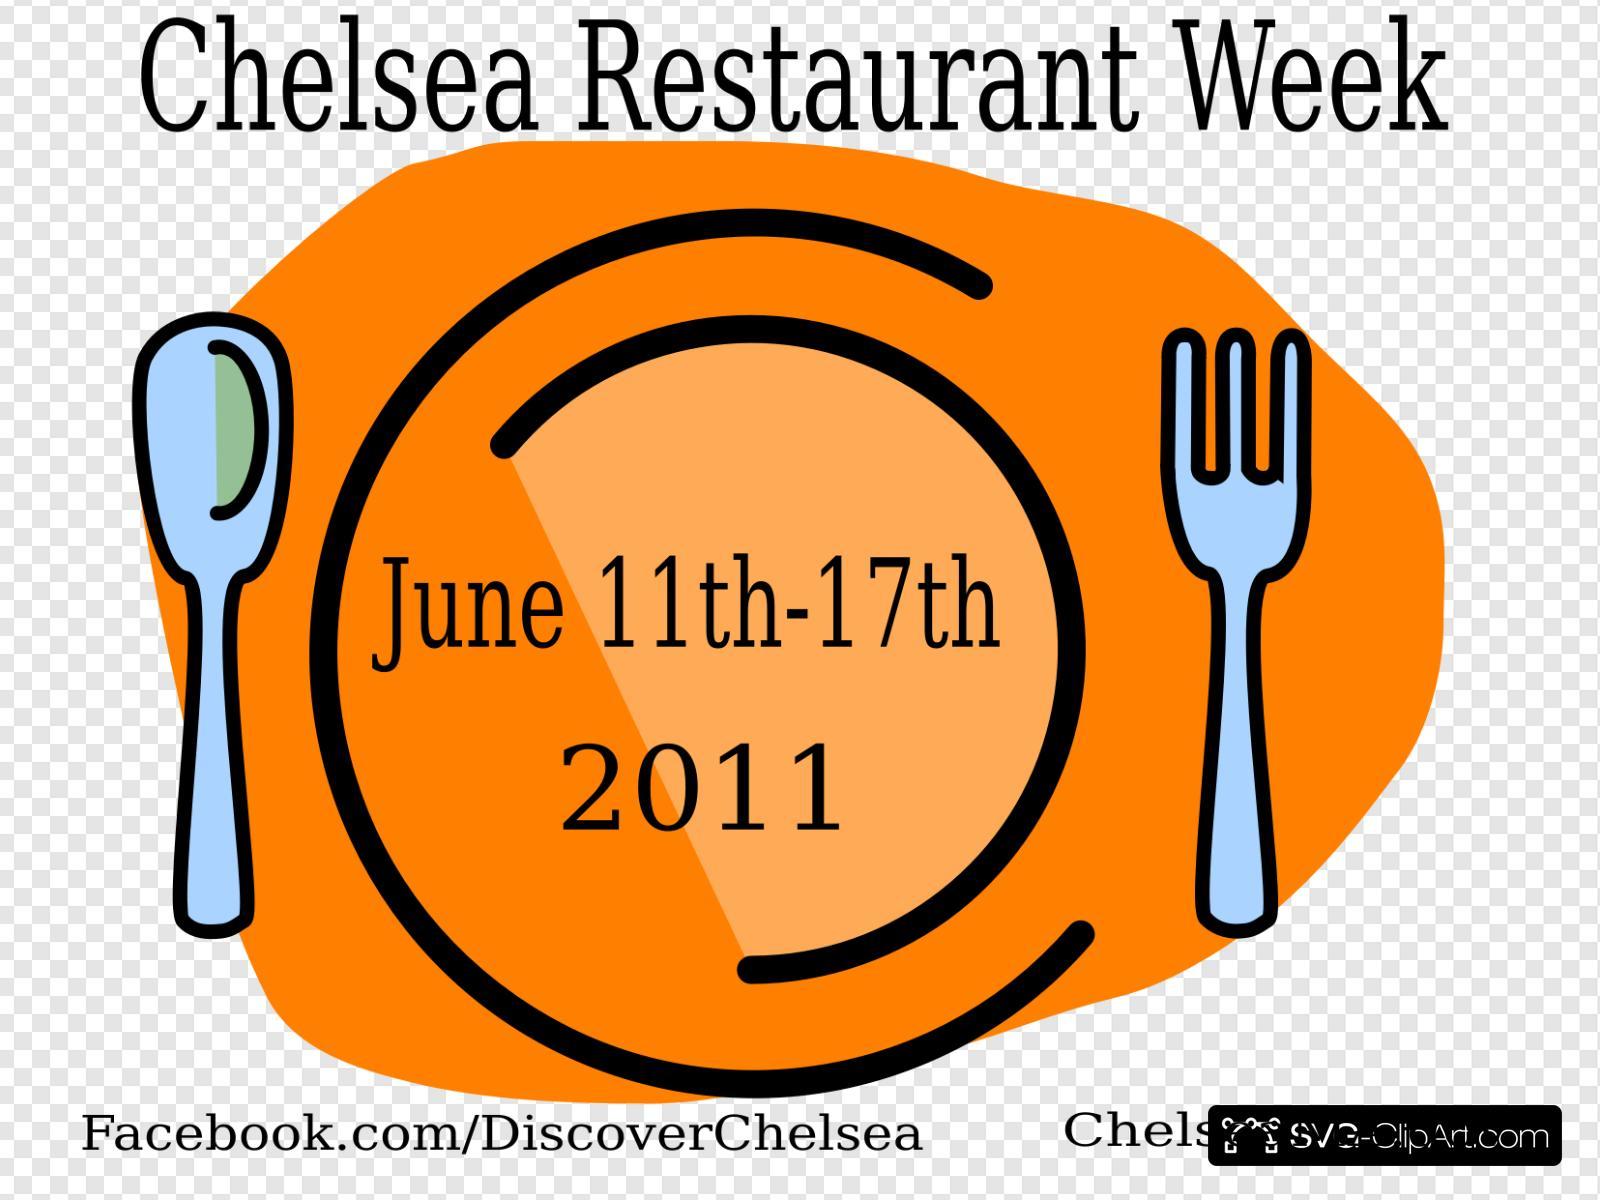 Clipart restaurant week. Chelsea clip art icon